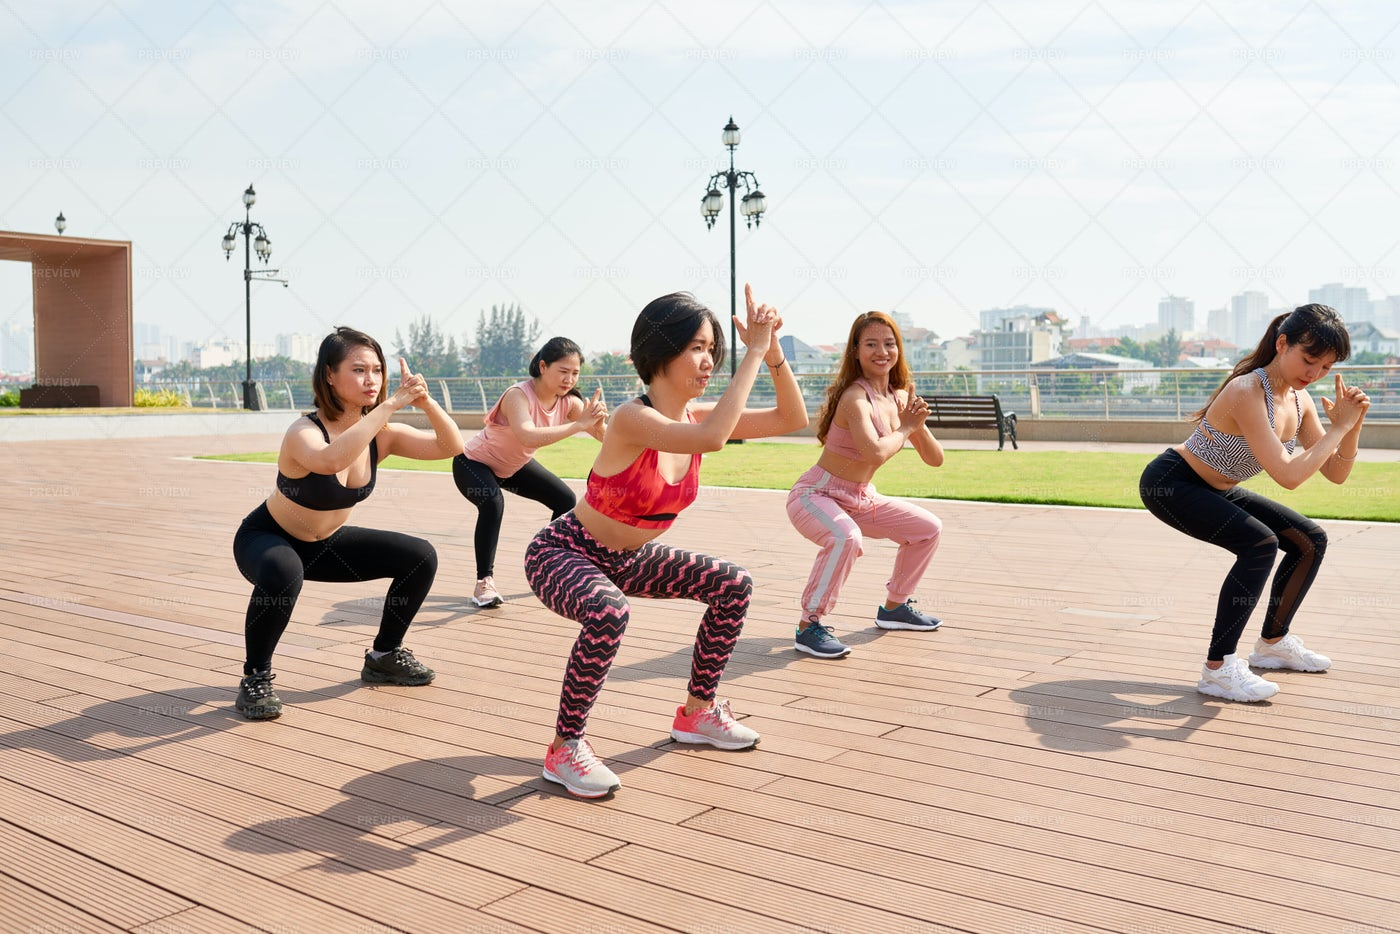 Contemporary Athletic Women Doing Yoga: Stock Photos